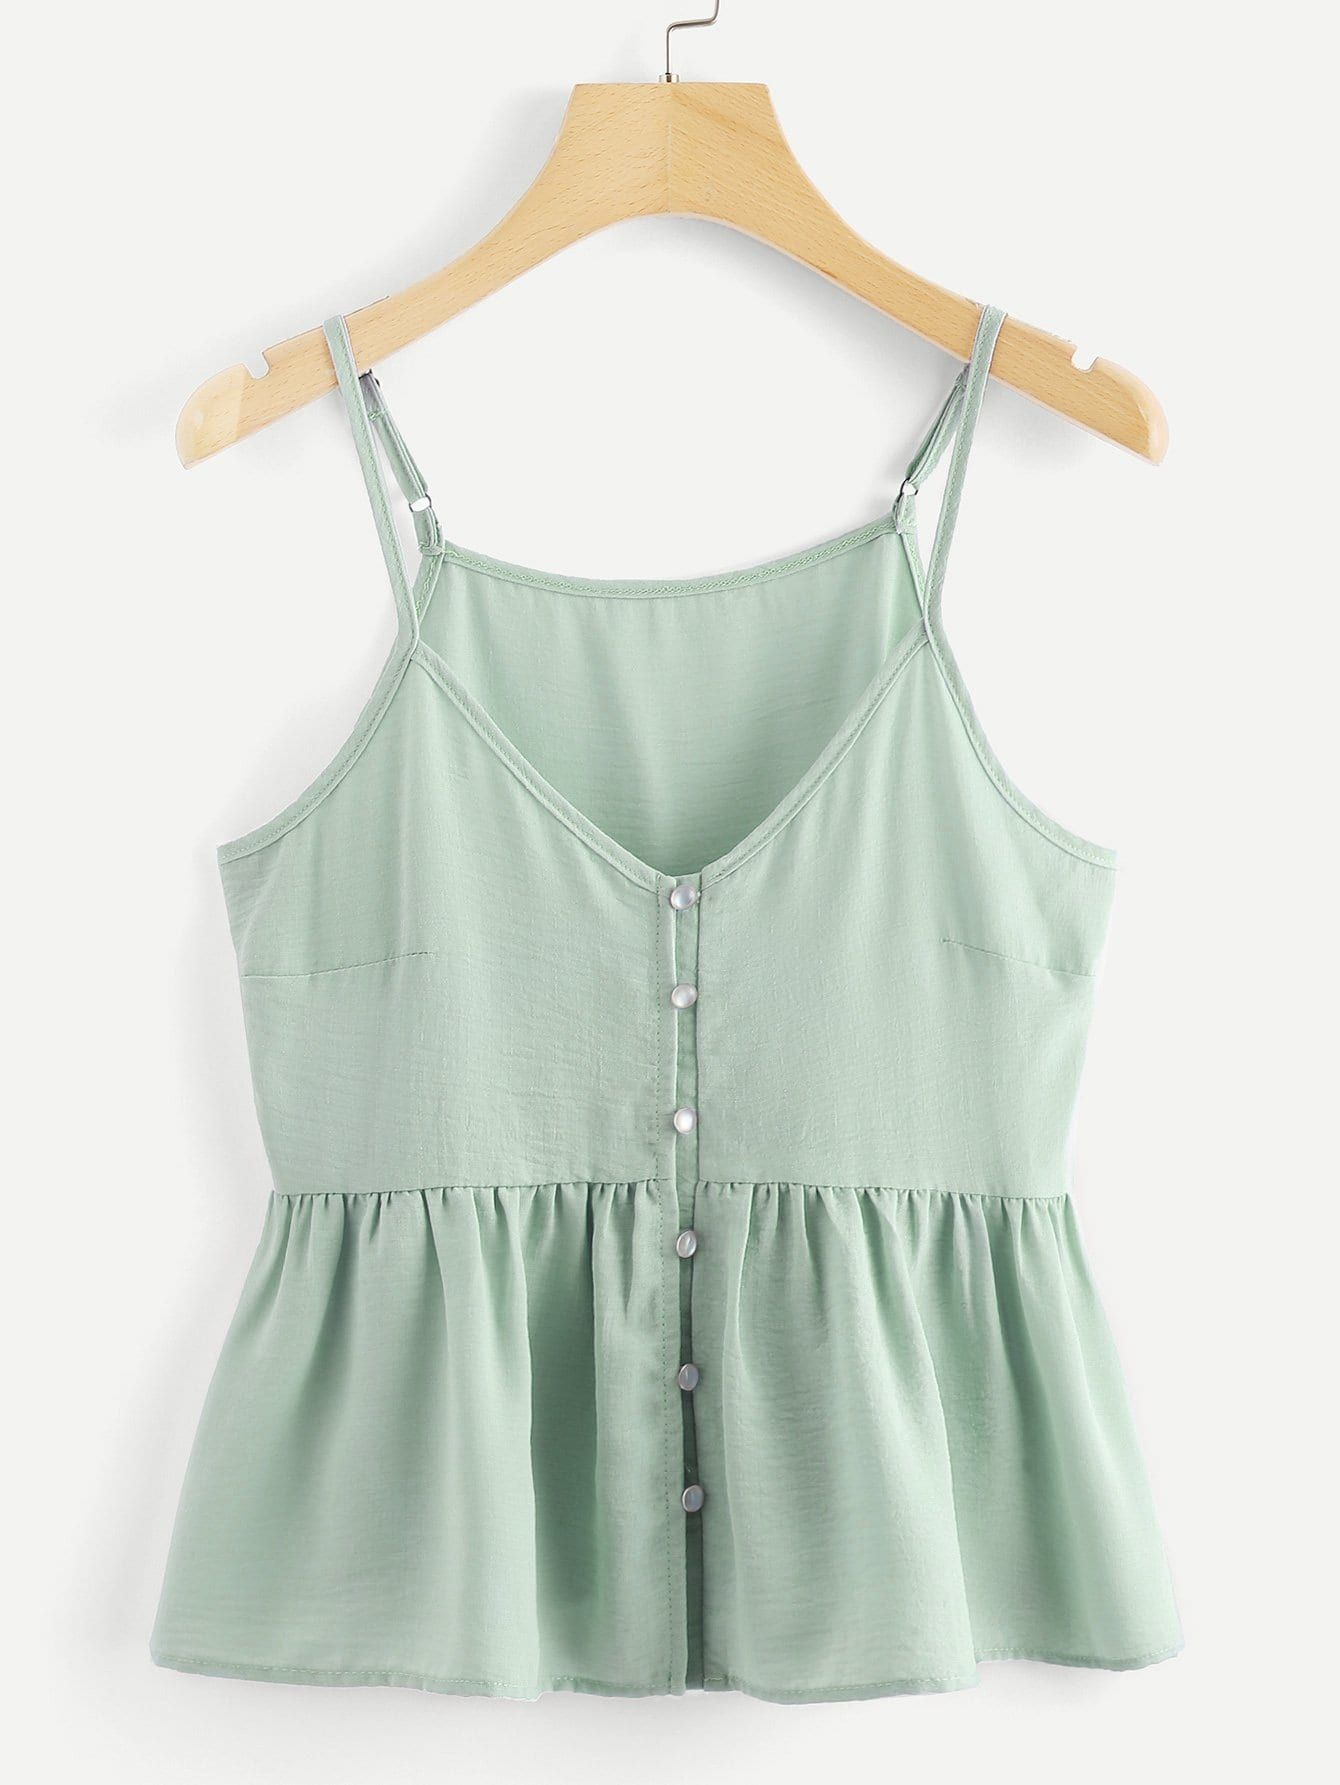 Cute Cami Plain Regular Fit Spaghetti Strap Green Regular Length Single Breasted Solid Cami Top